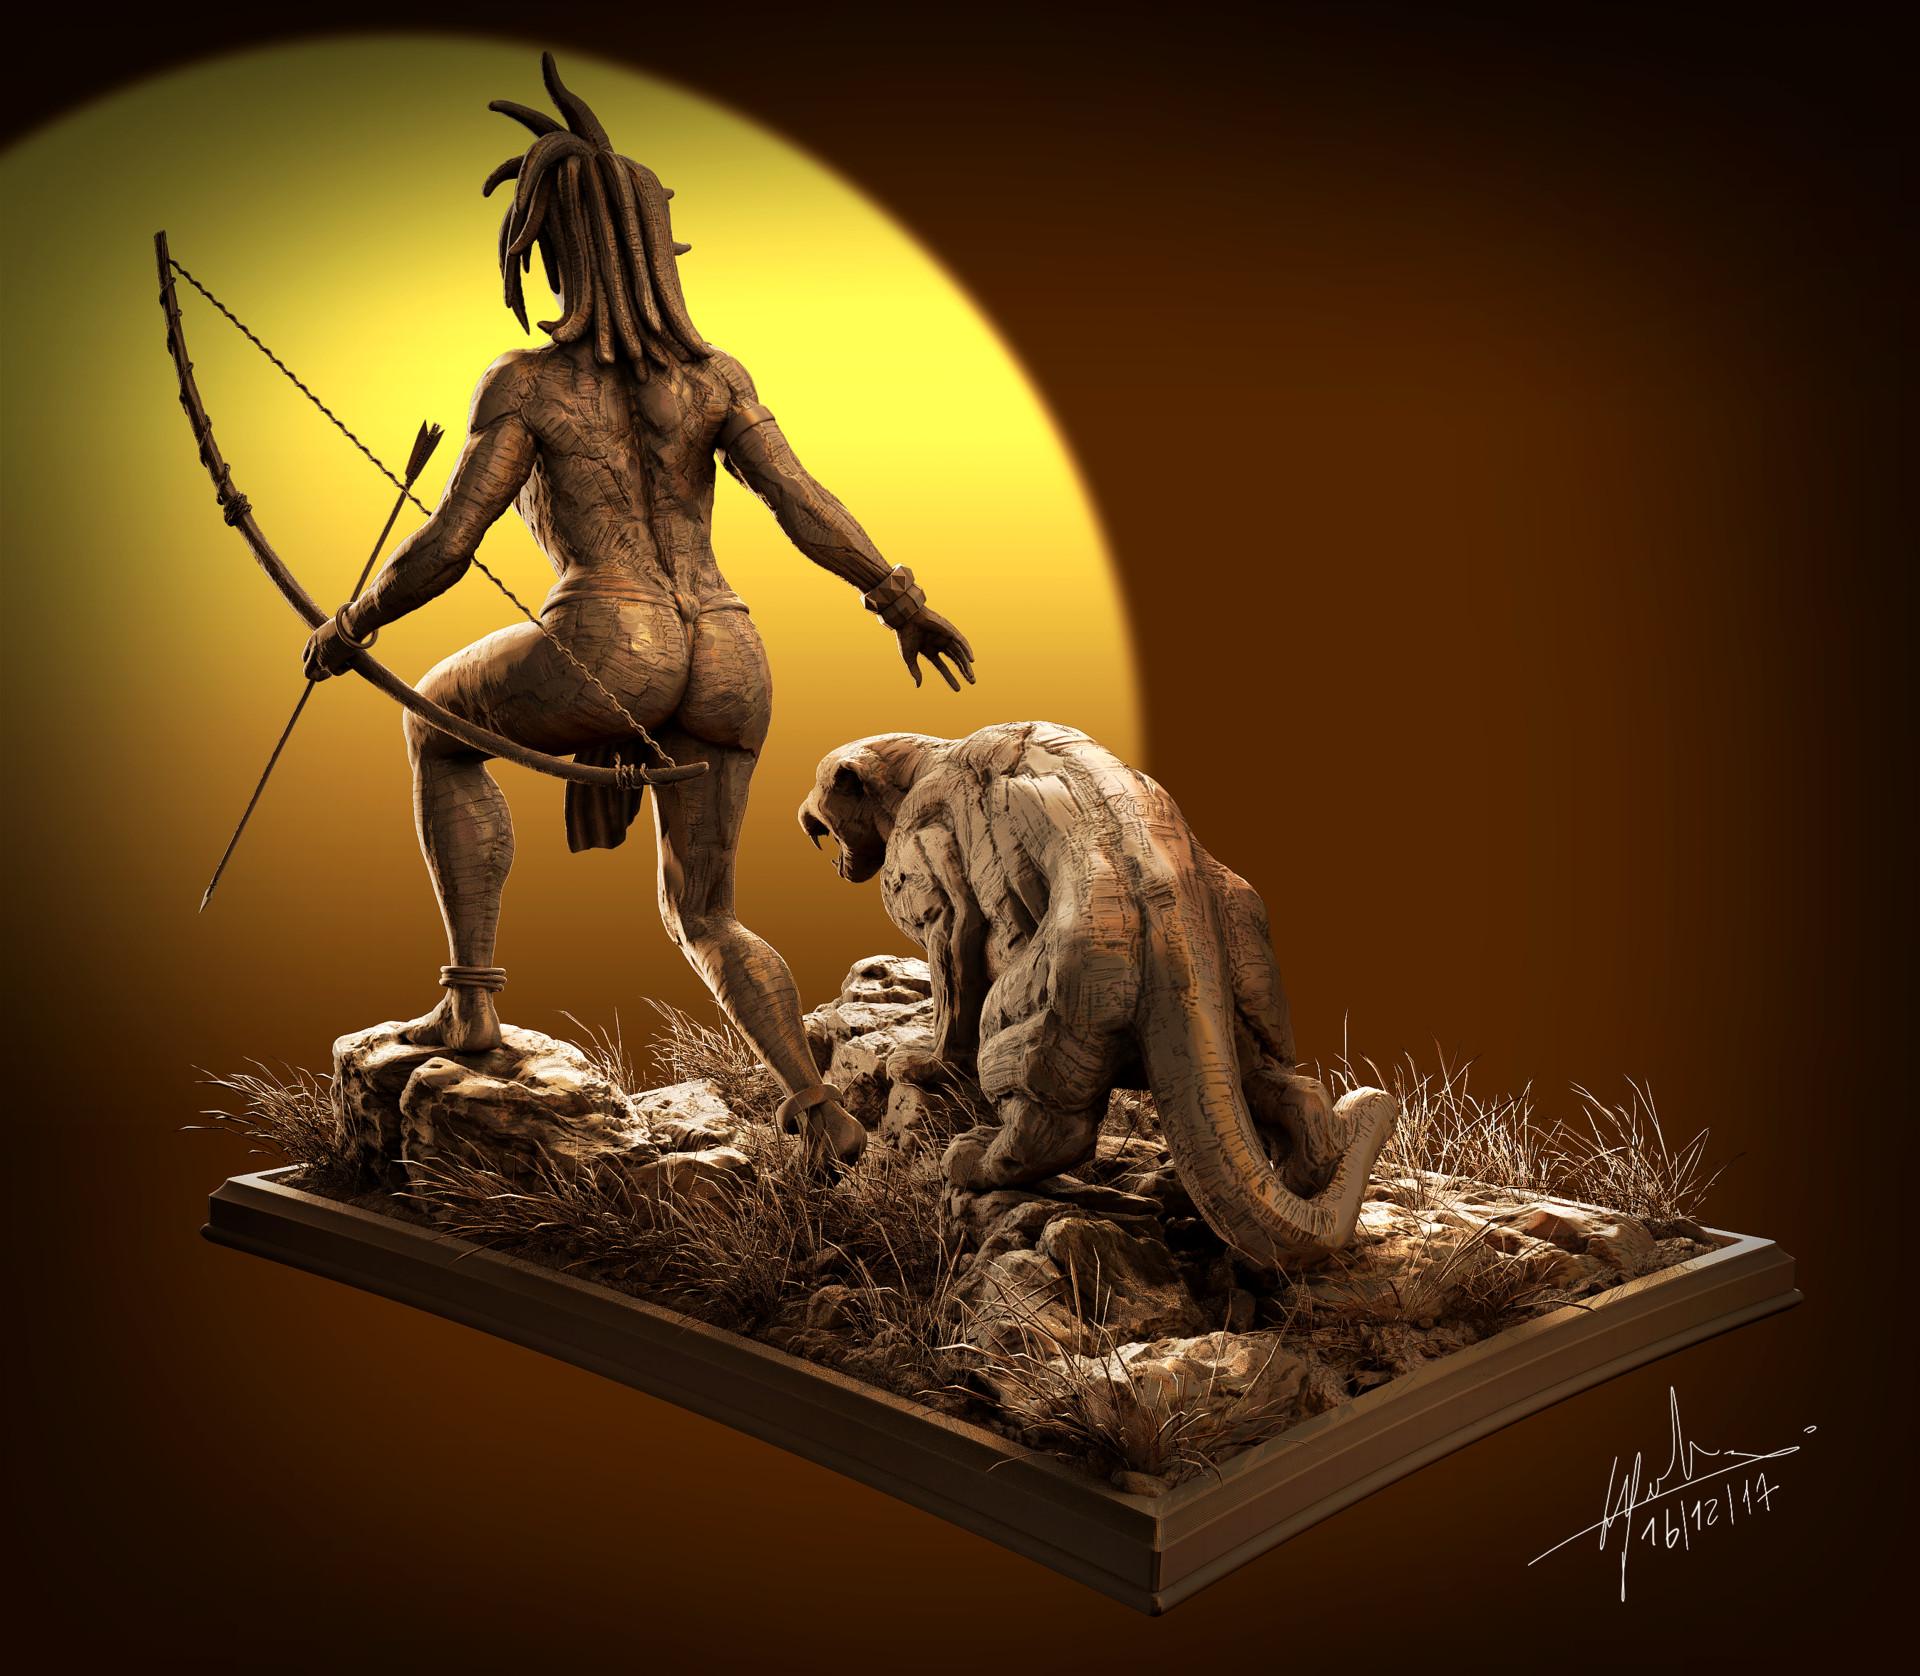 Fabien cazenabe black panter sculpt anatomy art cazenabe fabien 04